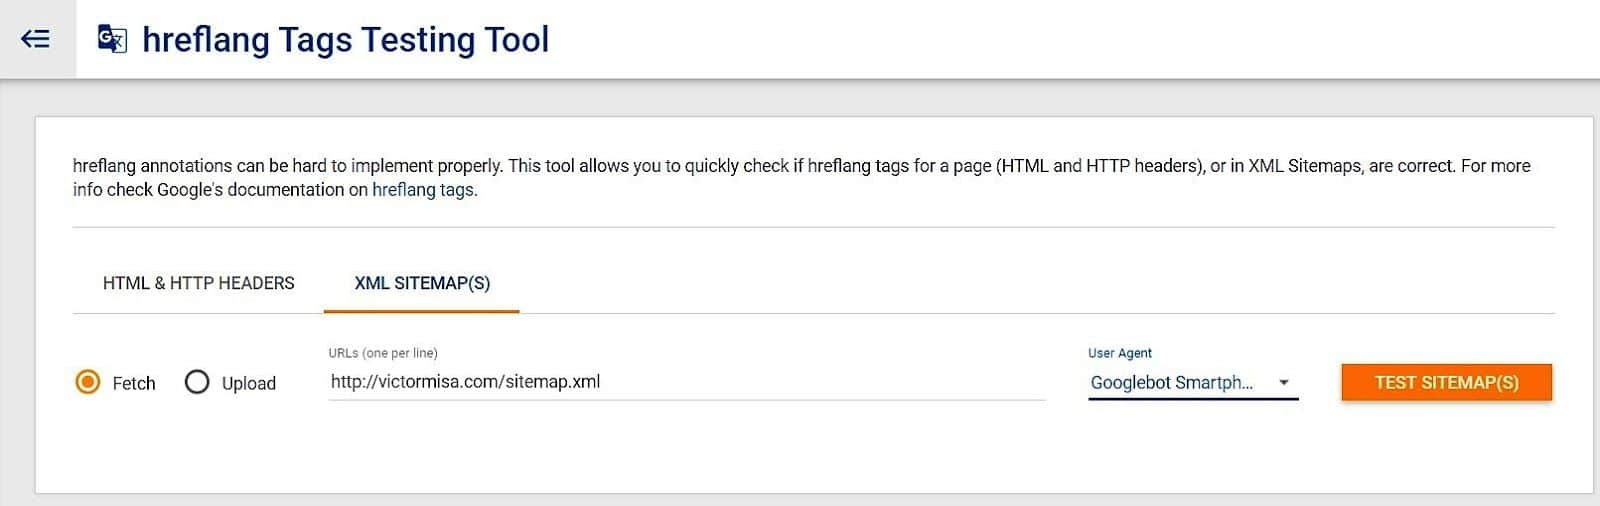 Herramienta de testeo de hreflang en Sitemap